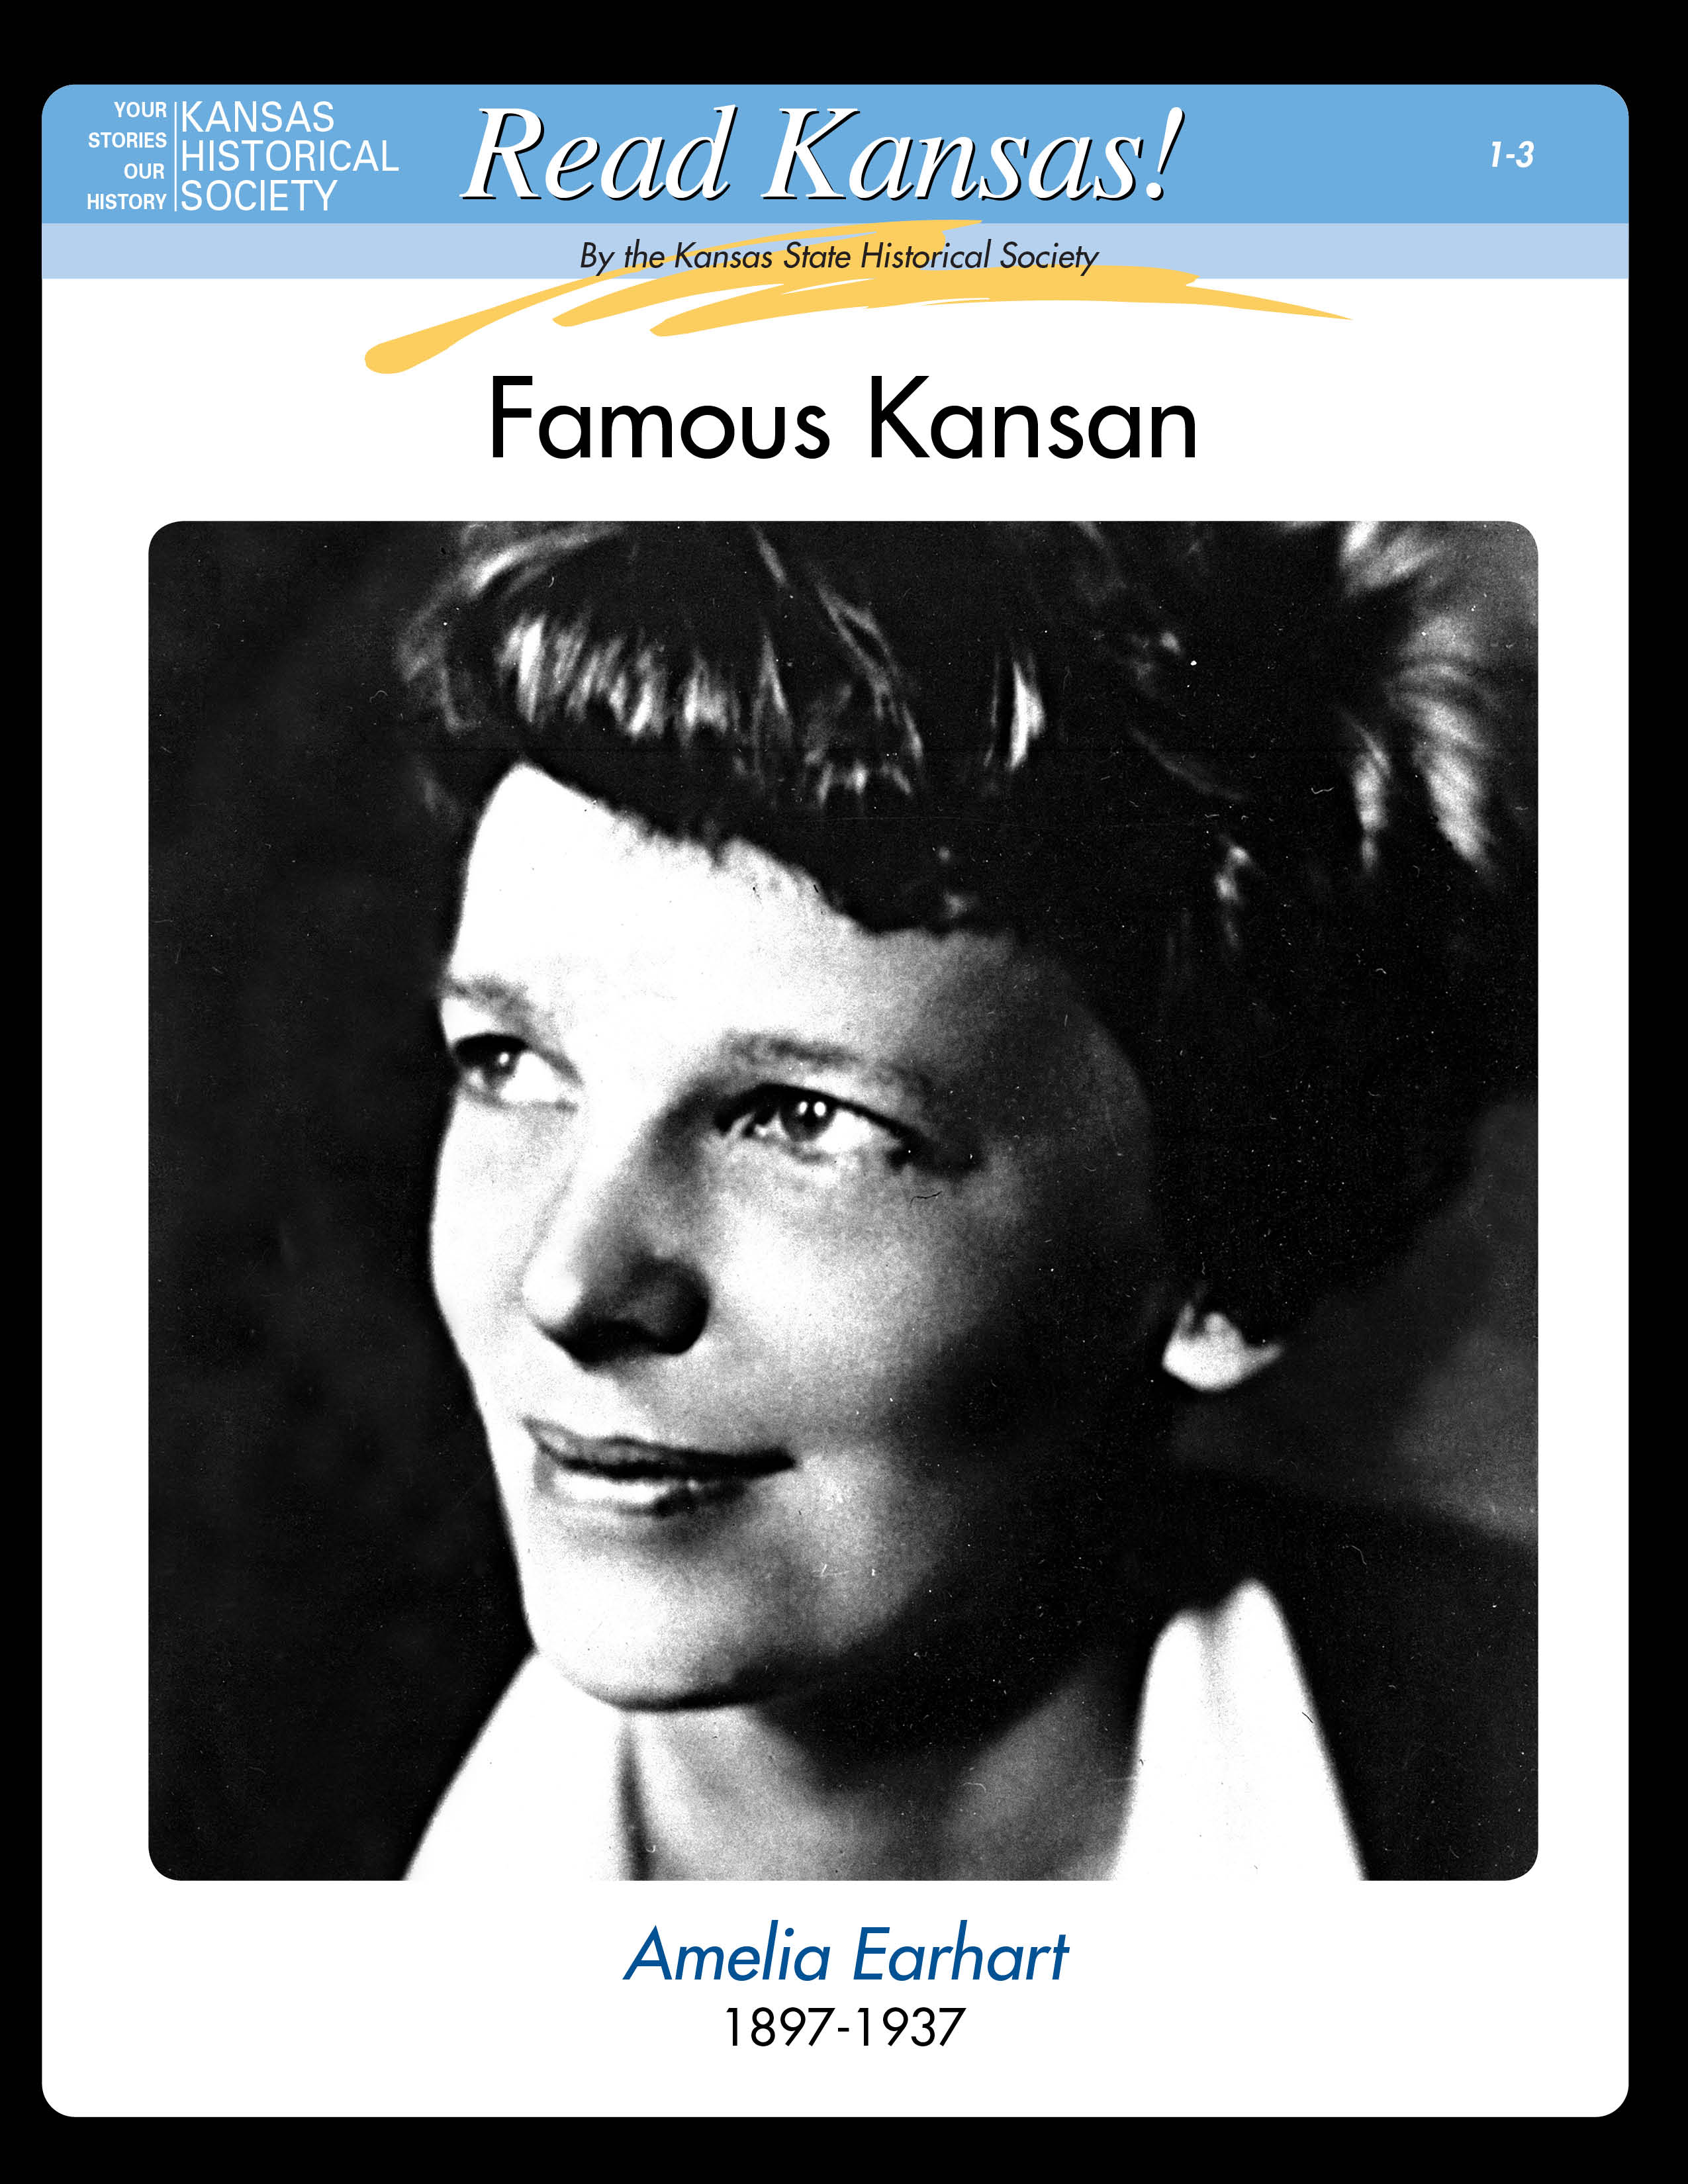 Read Kansas!: I-03 Famous Kansans